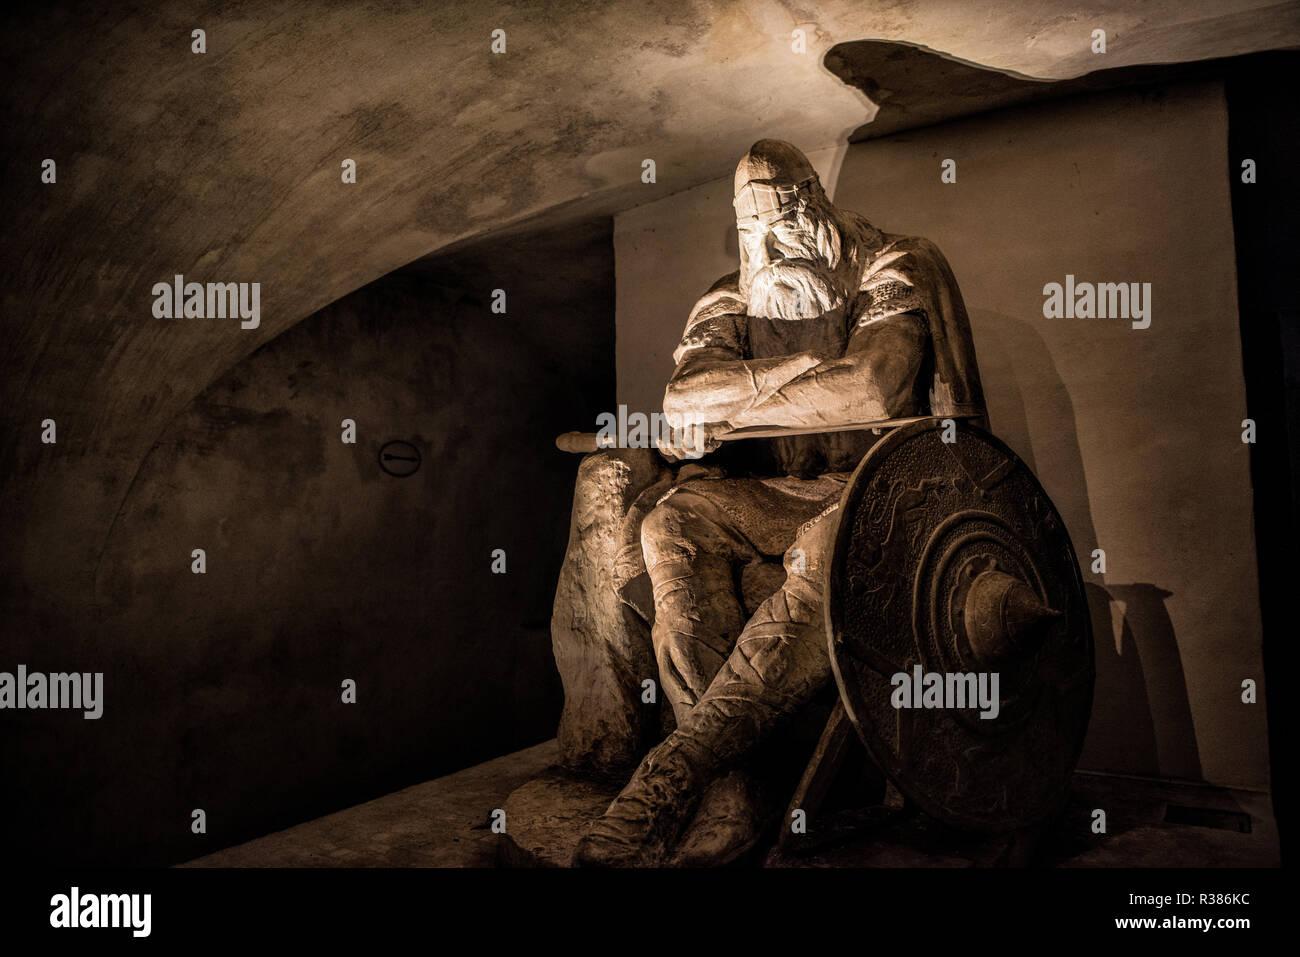 A statue of Holger the Dane by Hans Peder Pedersen-Dan in the casemates under Kronborg Castle. According to legend, Holger remains sleeping until he's - Stock Image